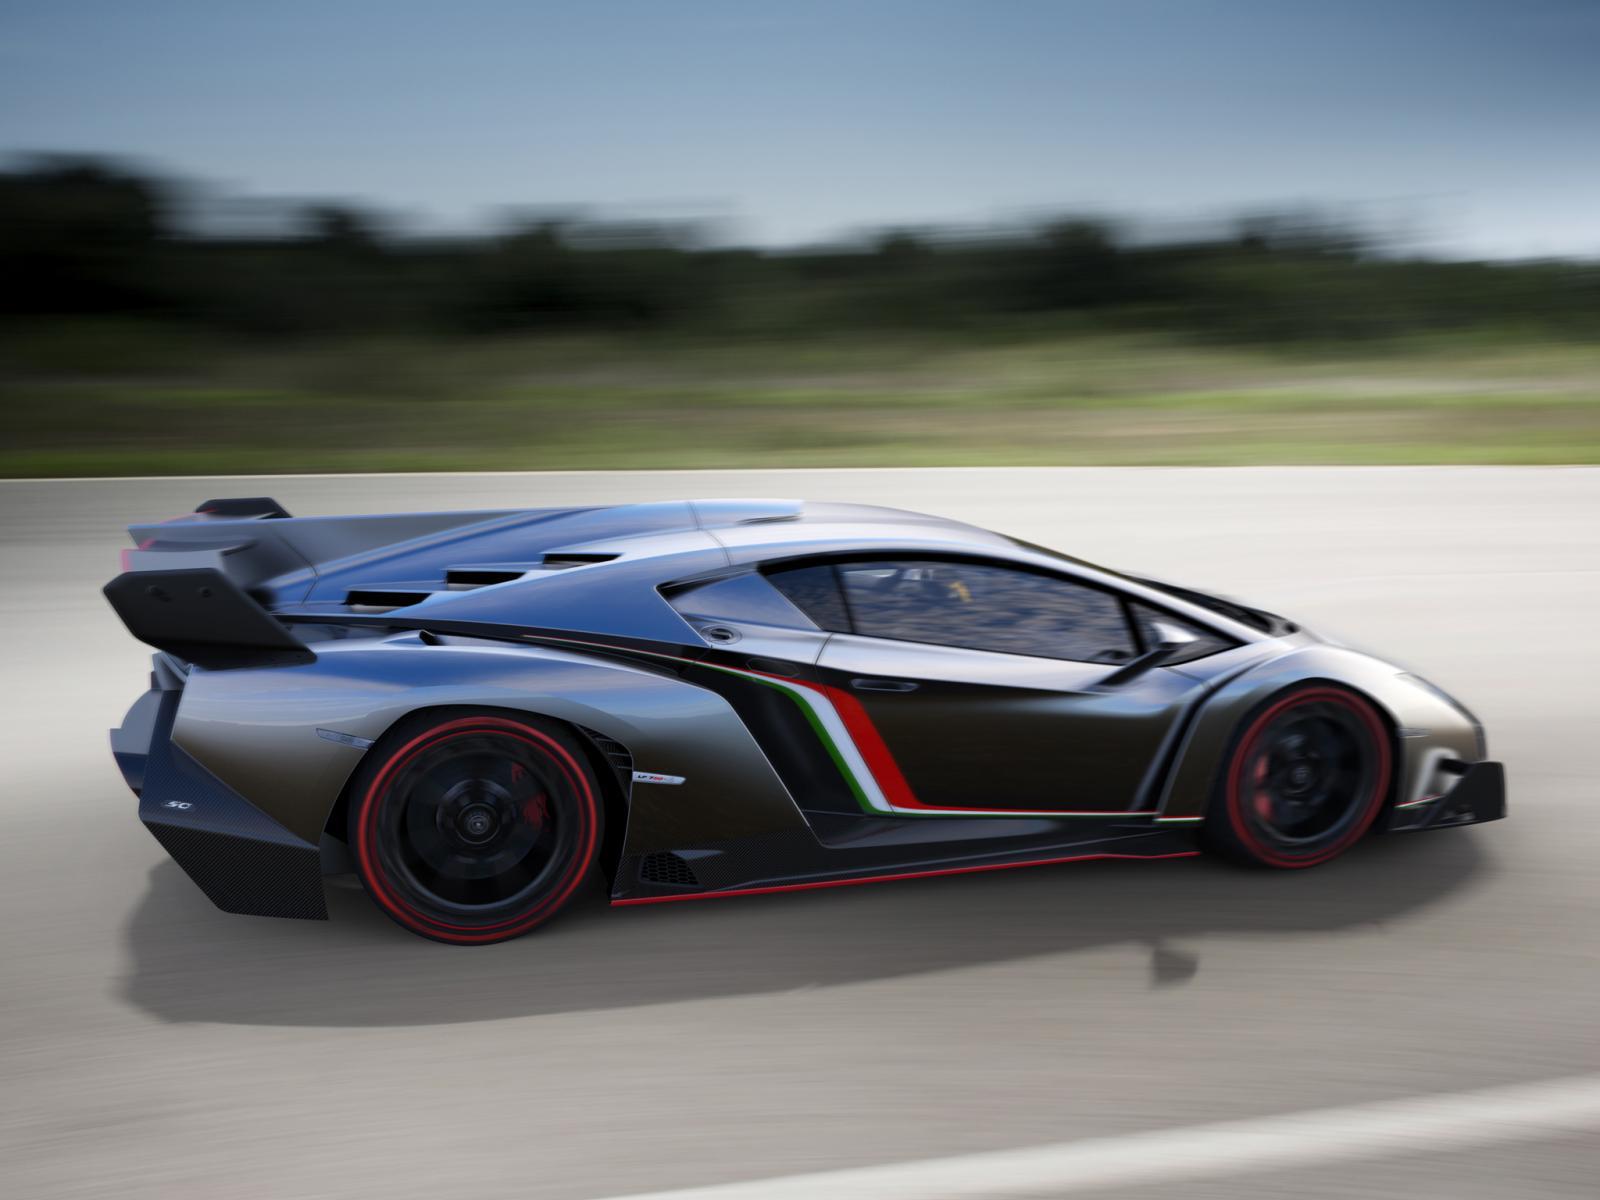 Lamborghini Veneno Hypercar Leaked Ahead Of Geneva Debut